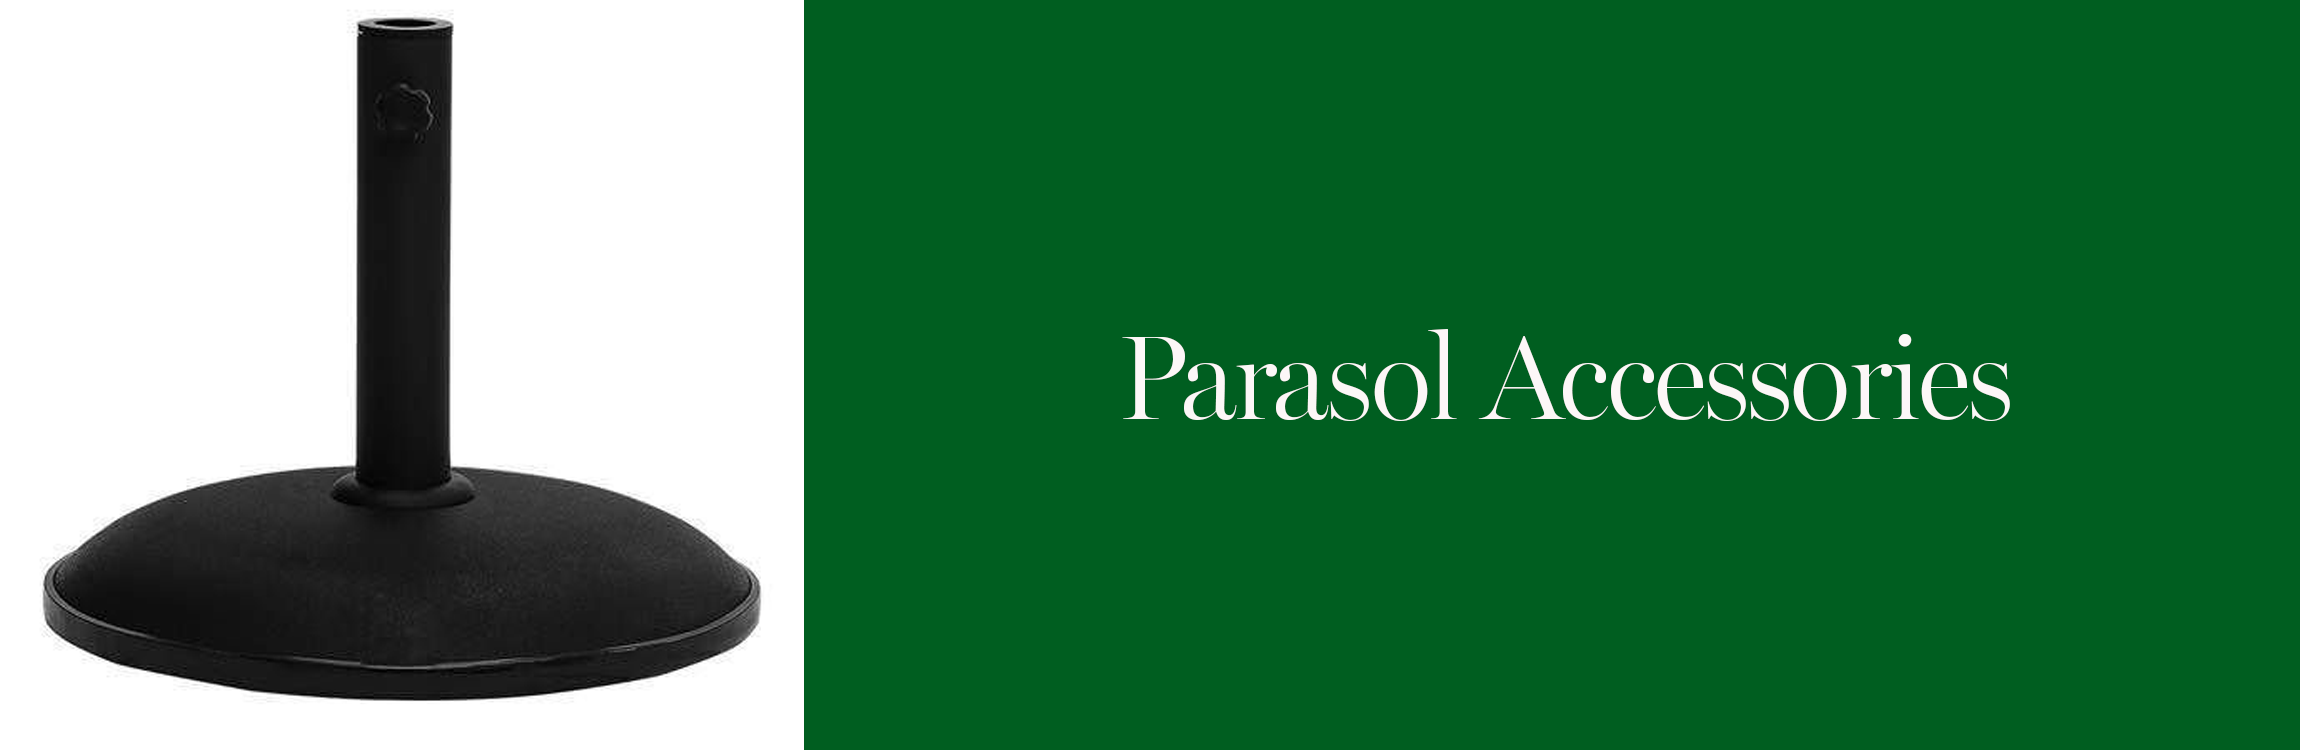 Parasol Accessories